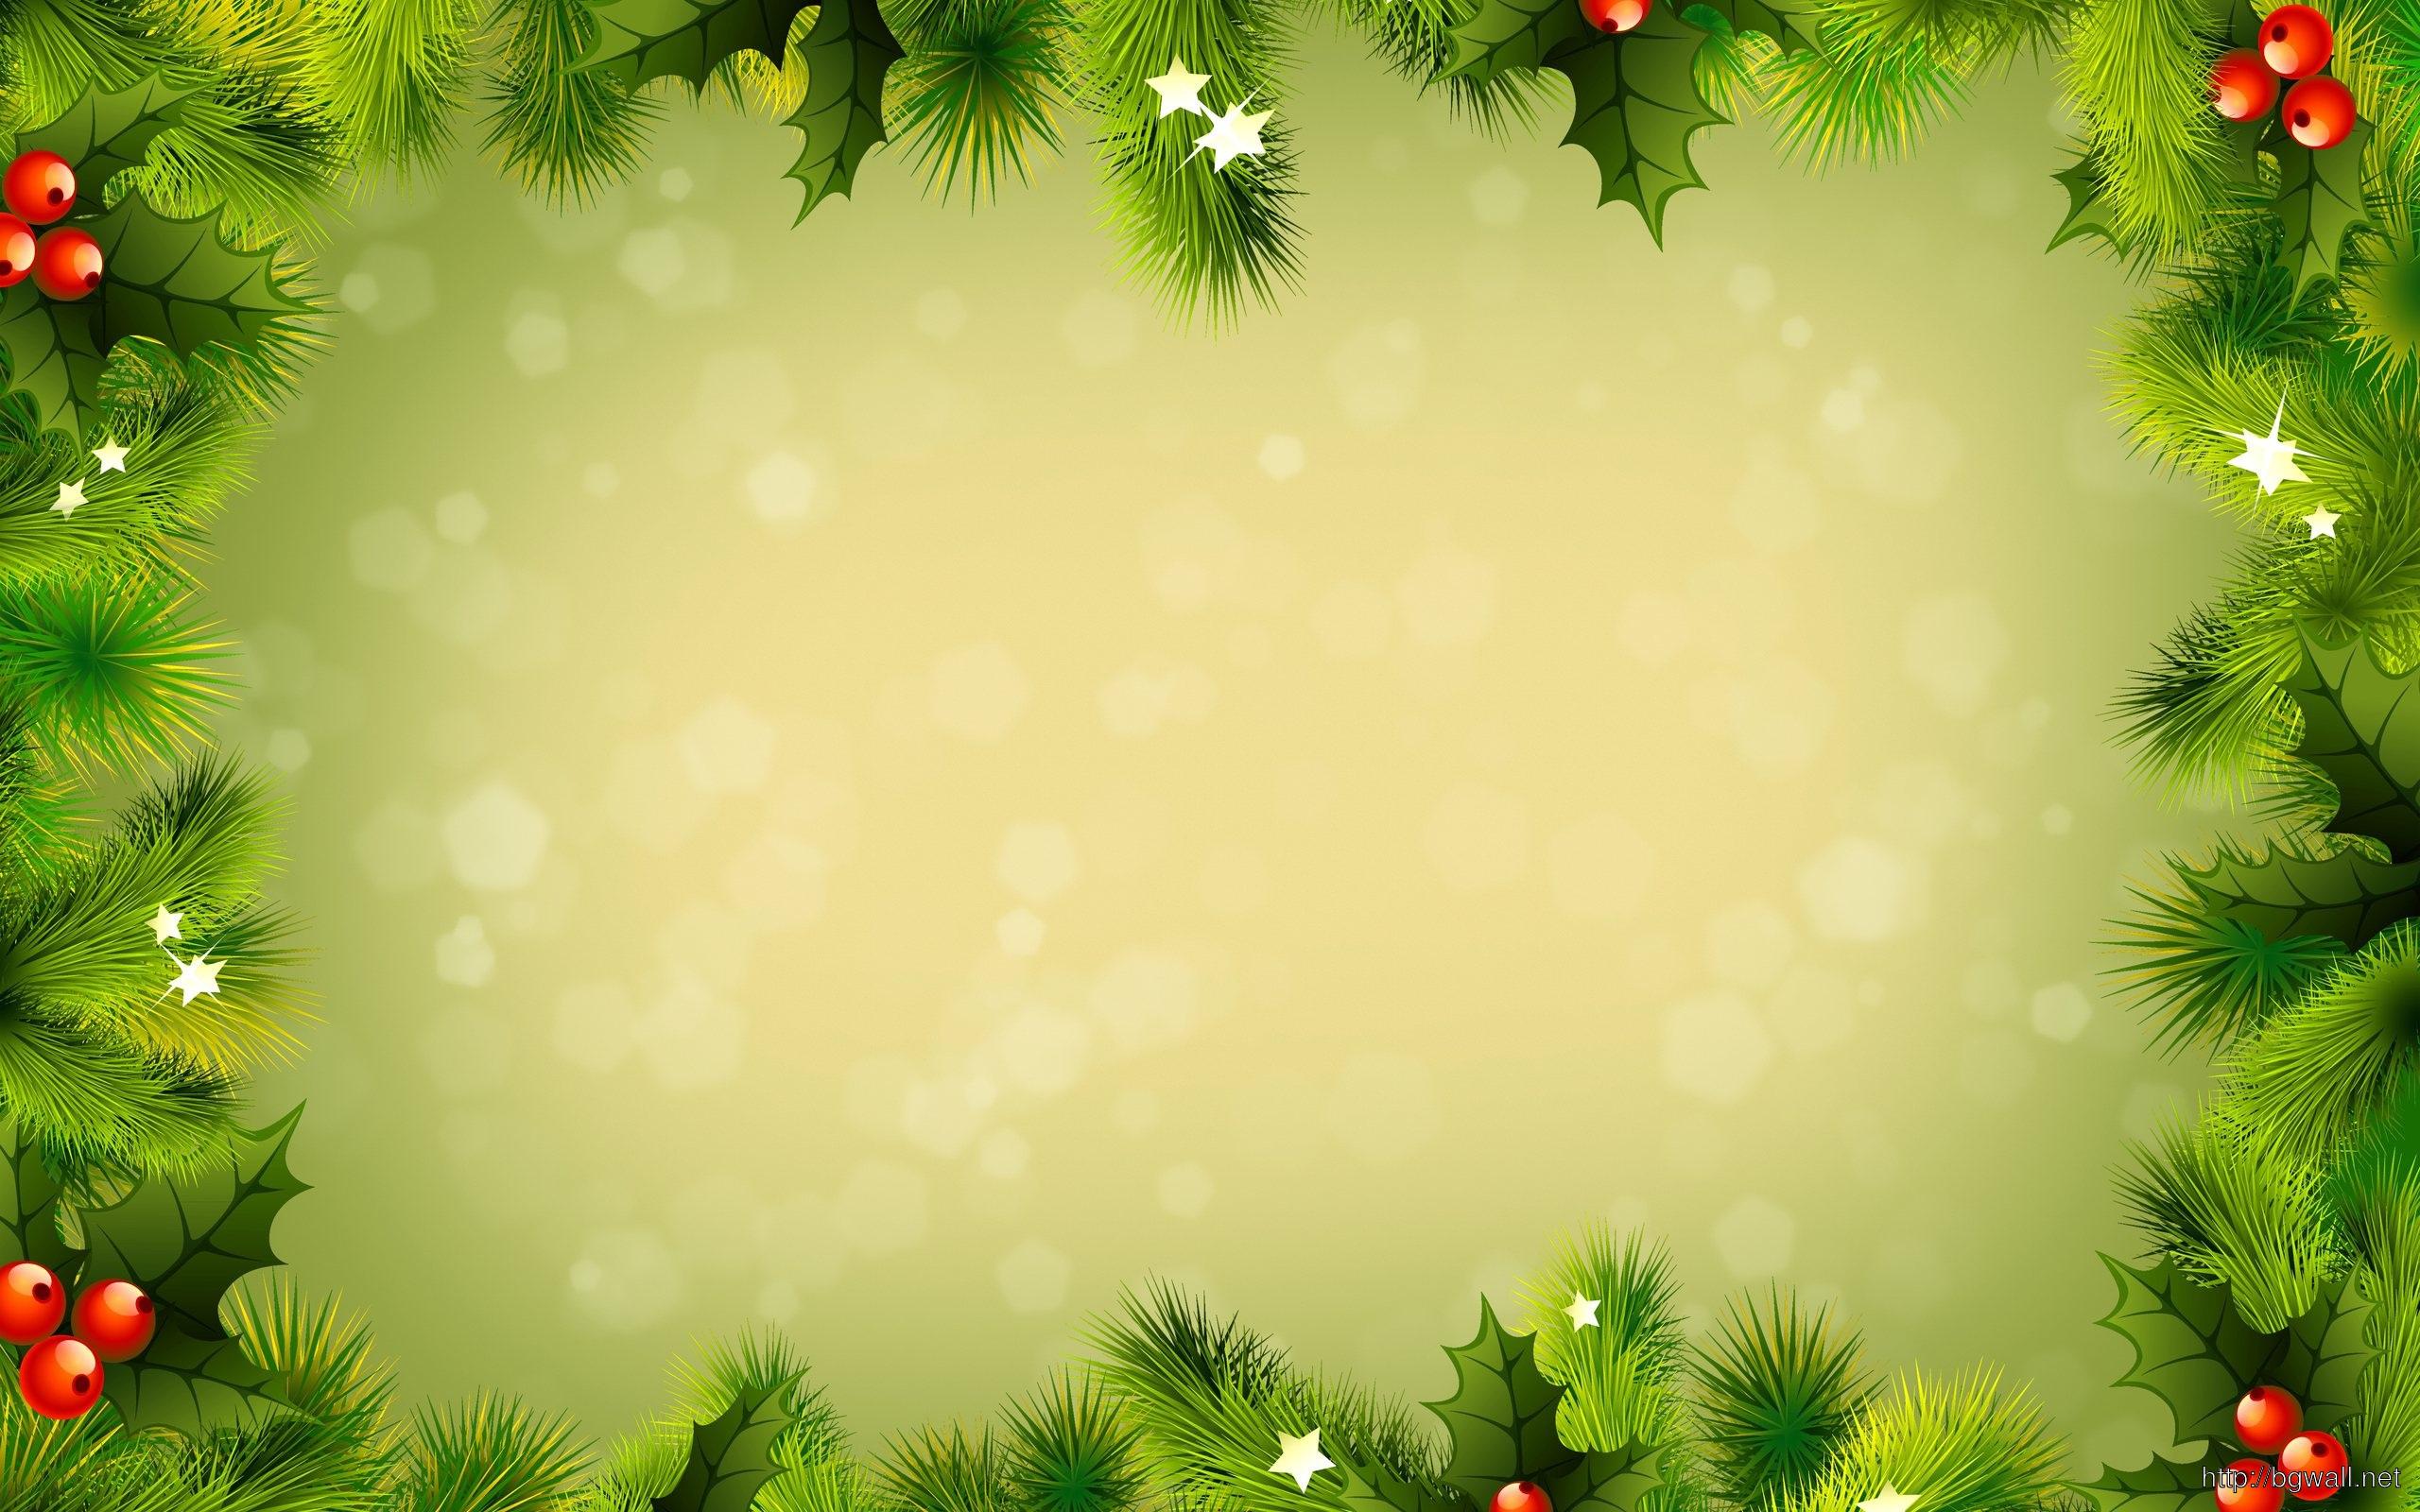 Christmas BackgroundWallpaper Background Wallpaper HD 2560x1600